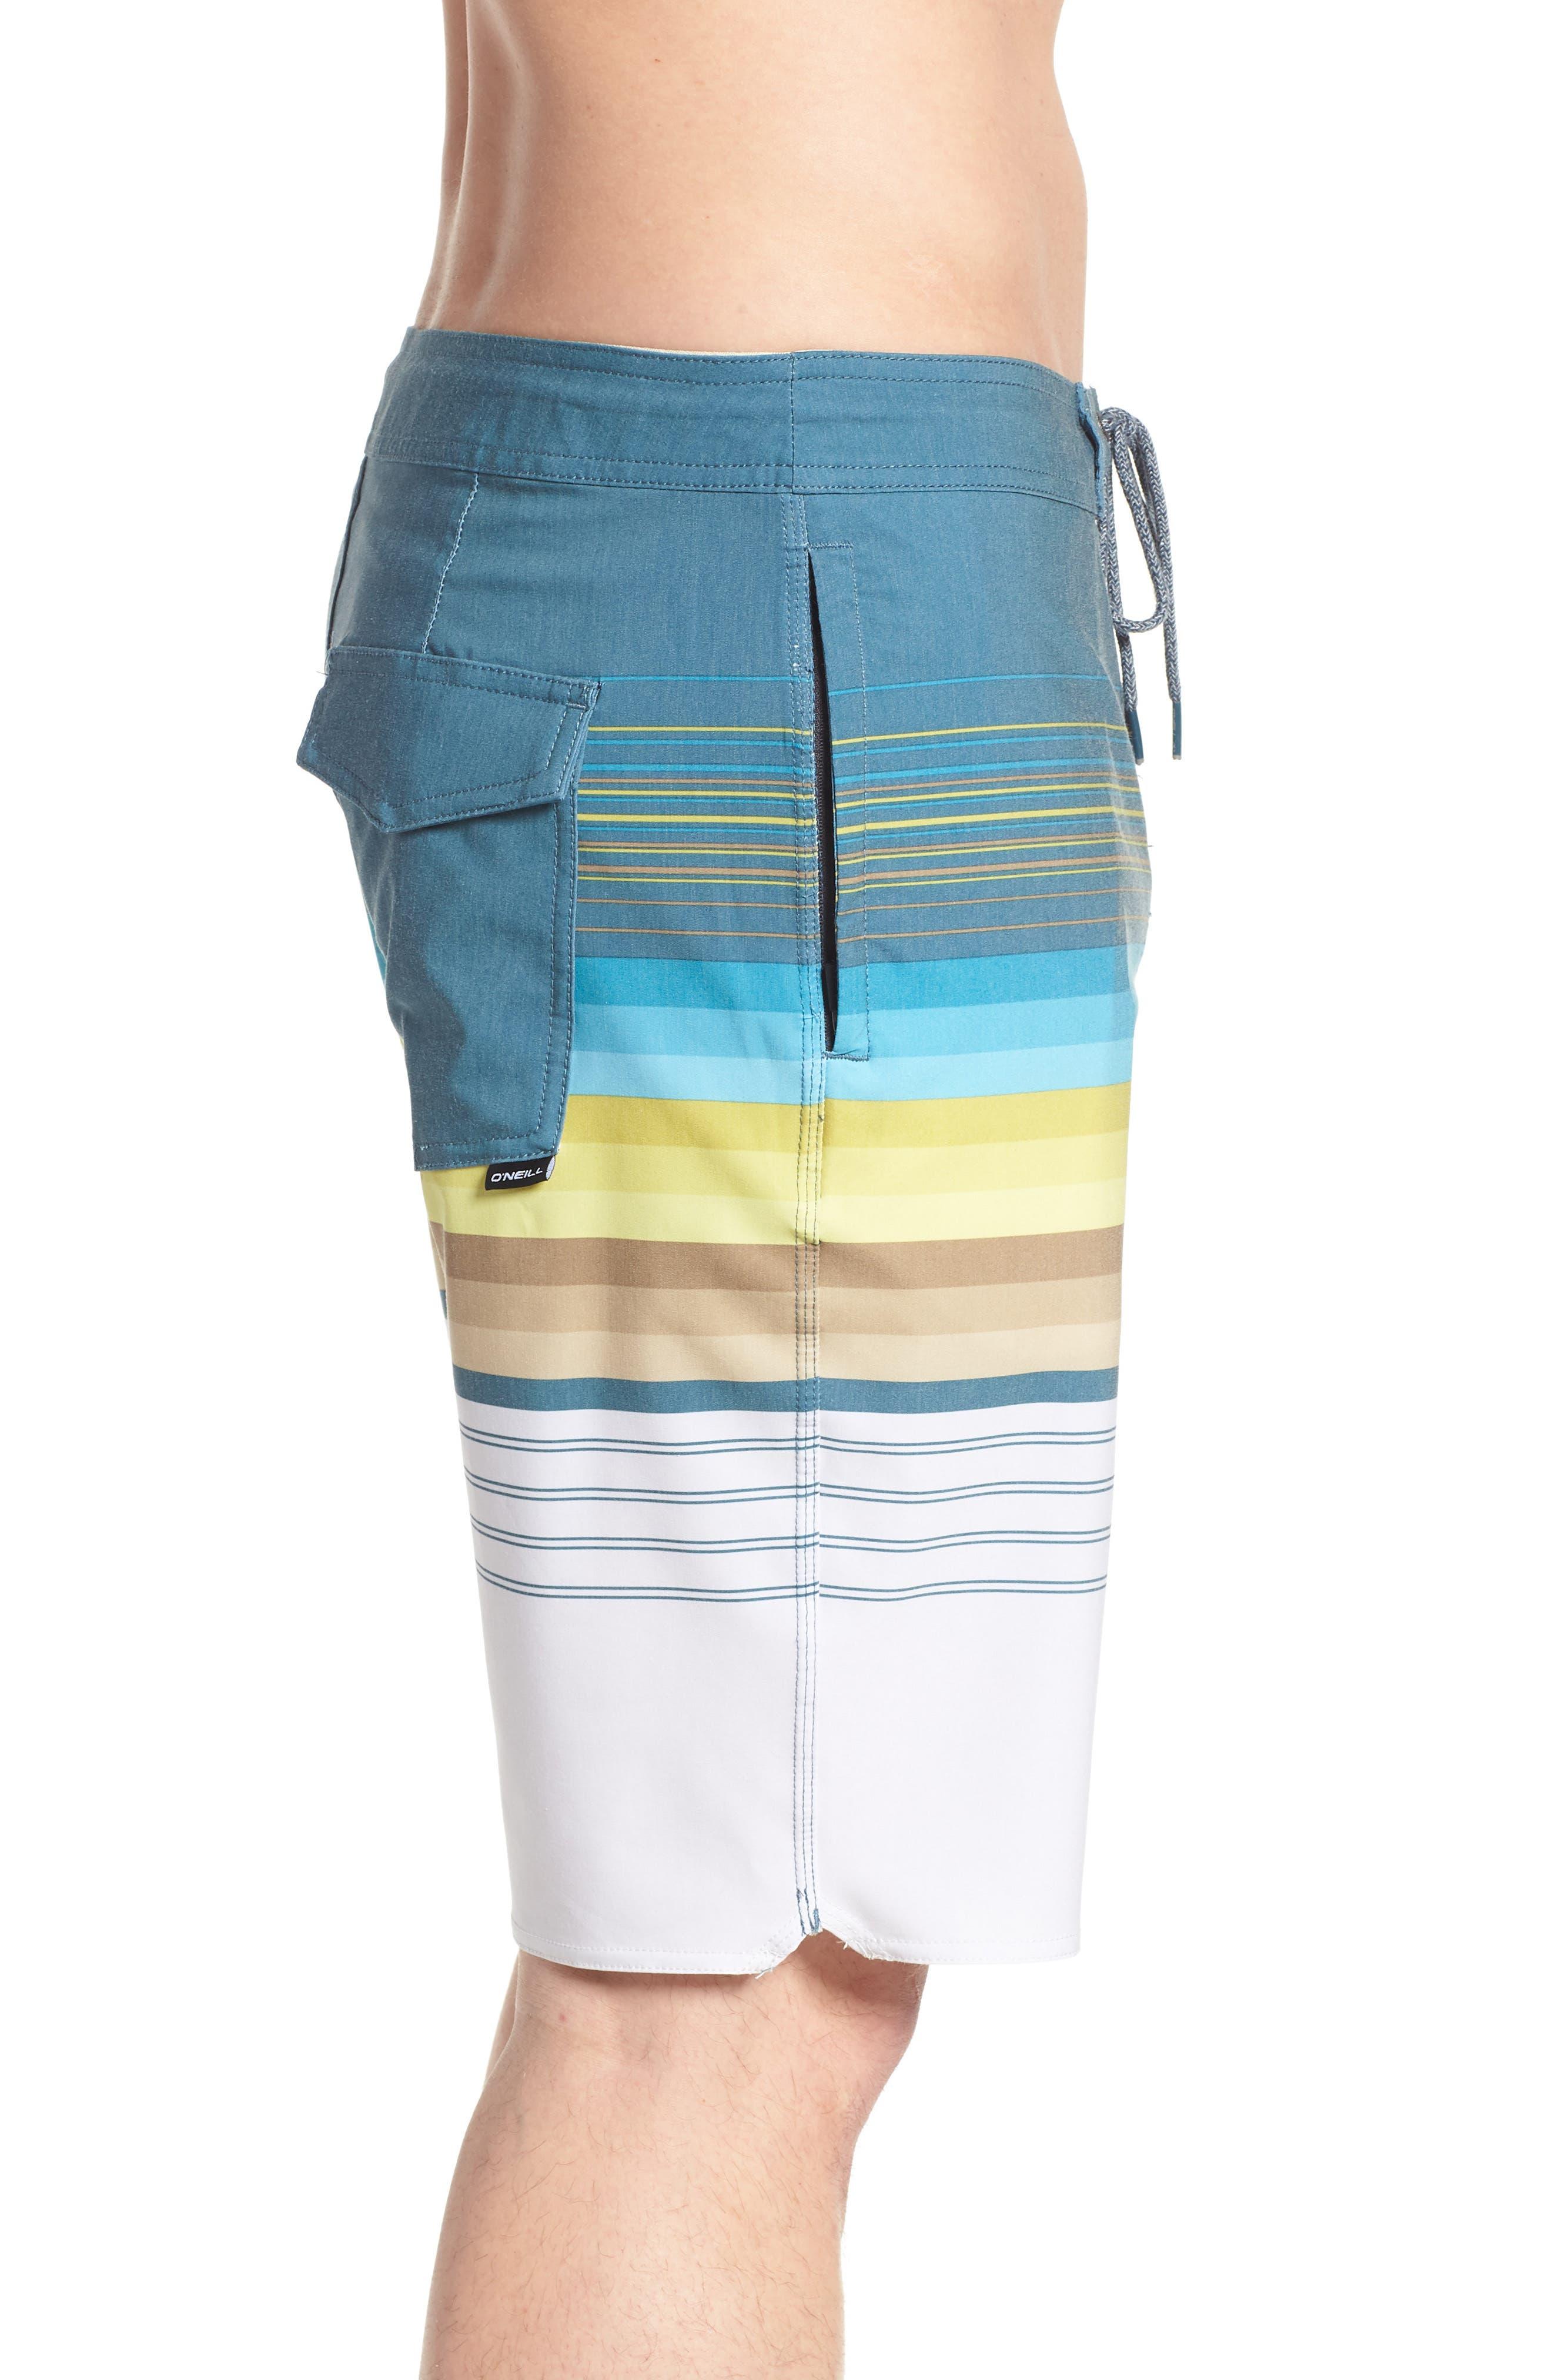 Sandbar Cruzer Board Shorts,                             Alternate thumbnail 4, color,                             Fog